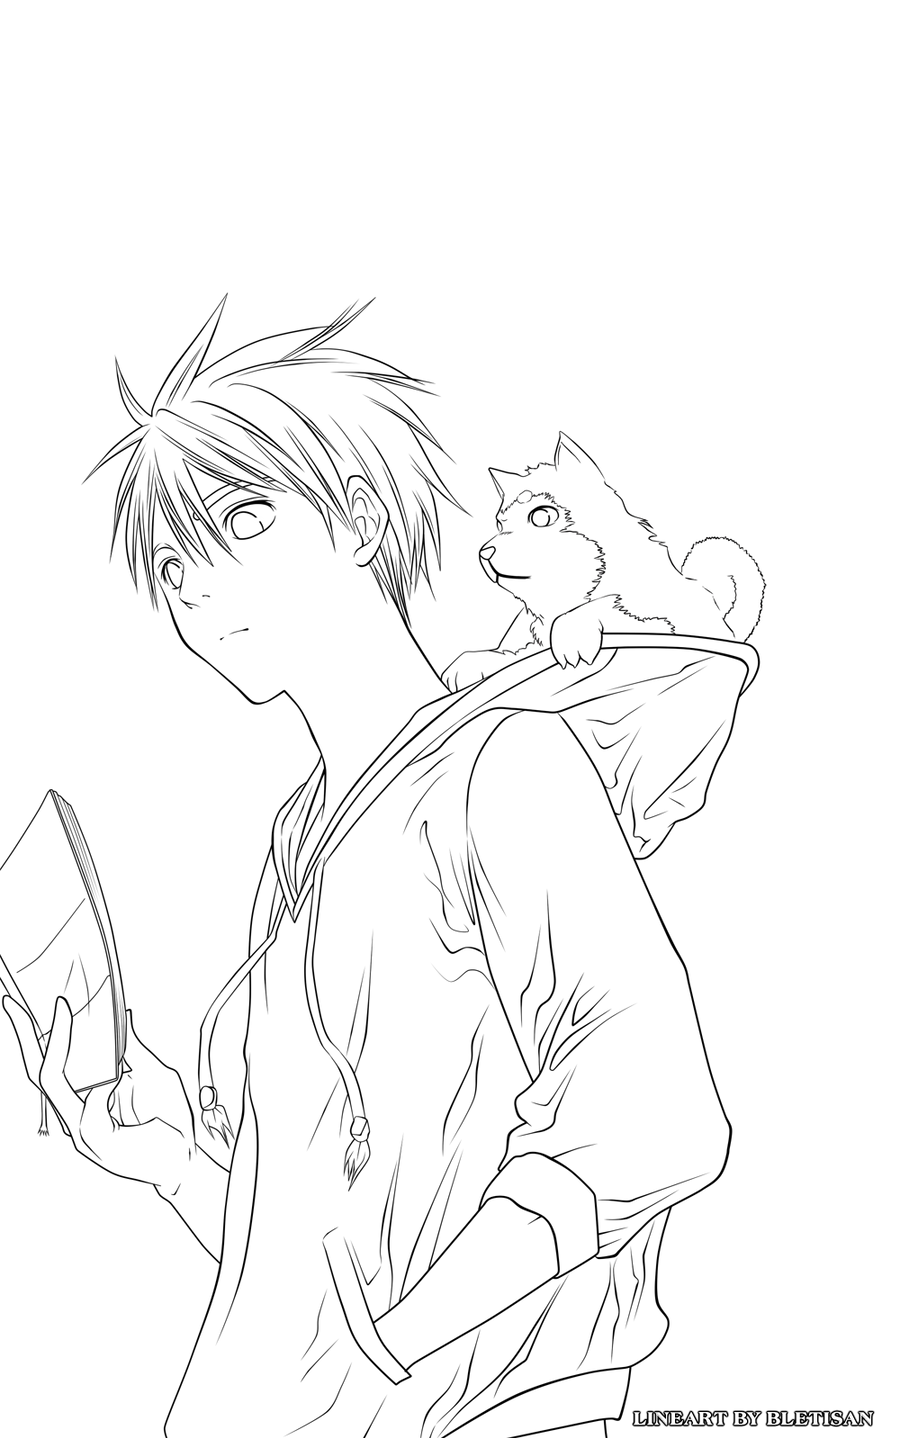 Line Art Kuroko : Kuroko lineart by bletisan on deviantart